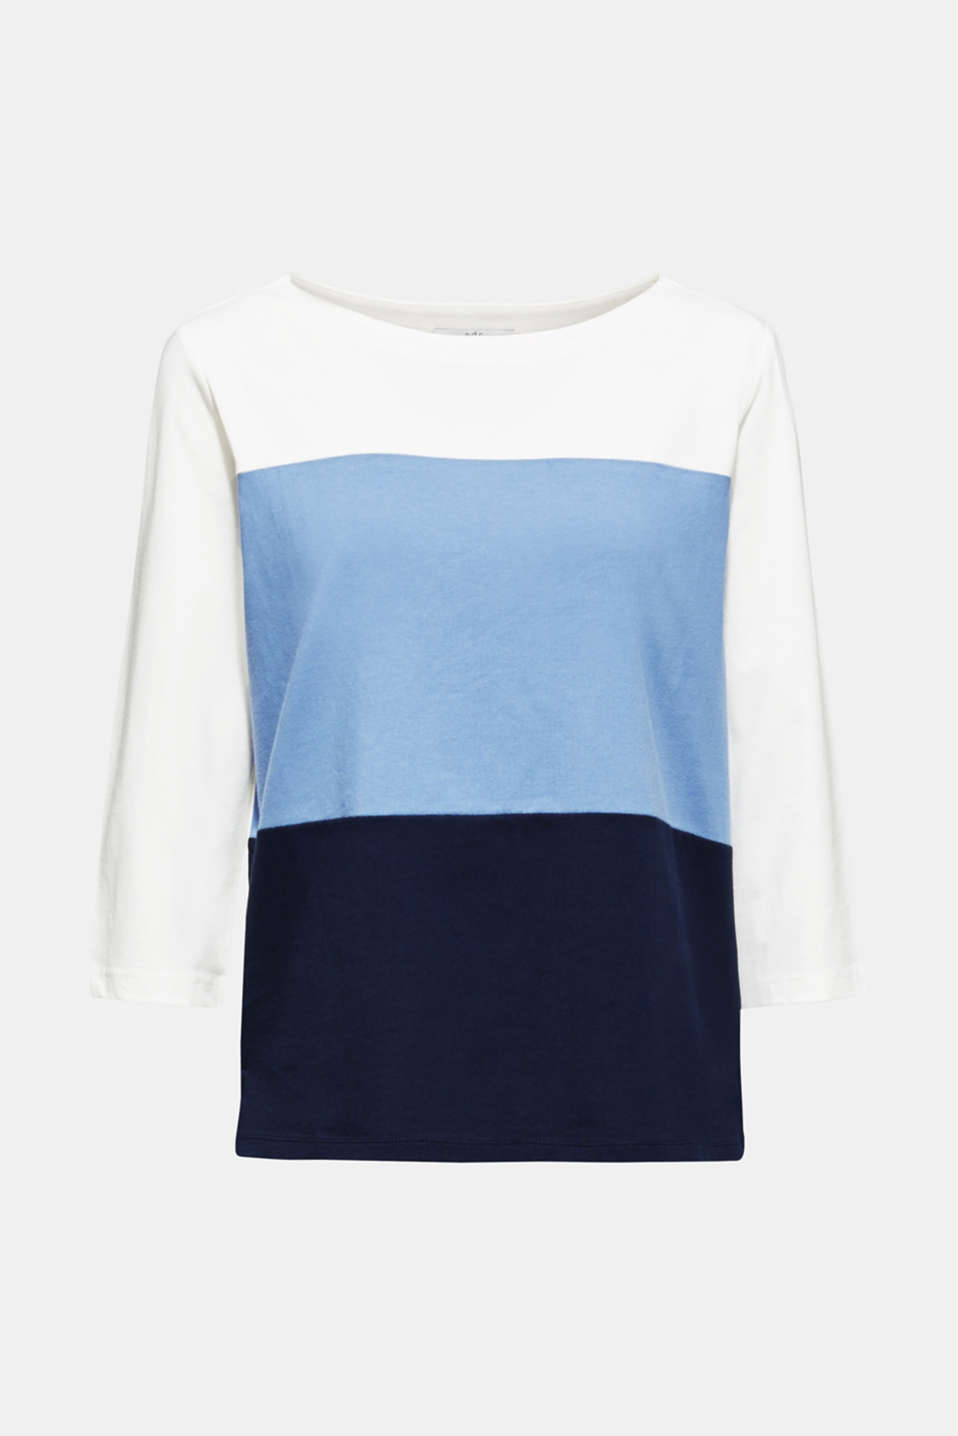 Top with block stripes, 100% cotton, BLUE LAVENDER, detail image number 7